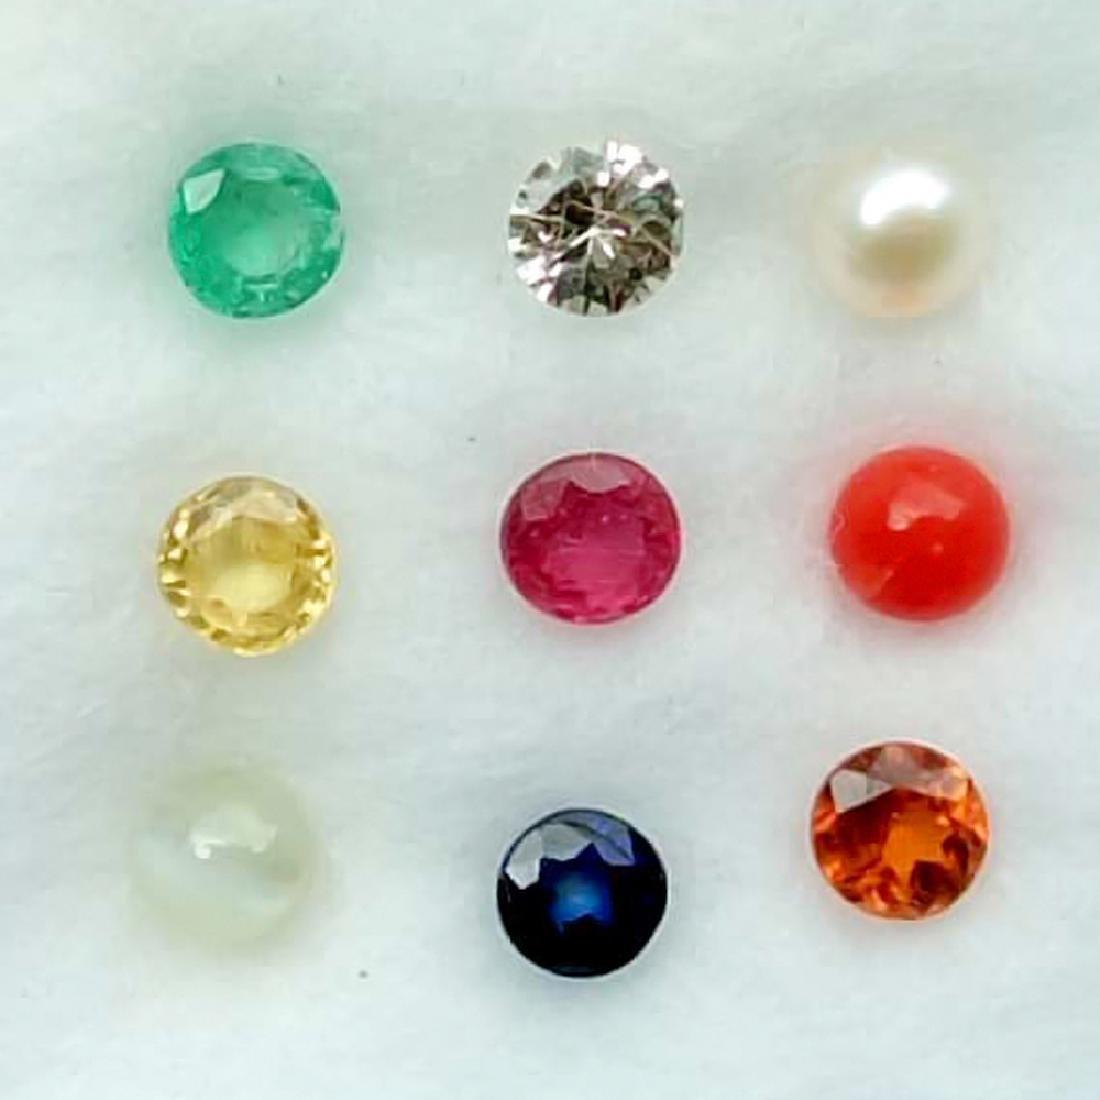 Calibrate 3 mm Round Natural Navratna 9 Gemstones Set - 2